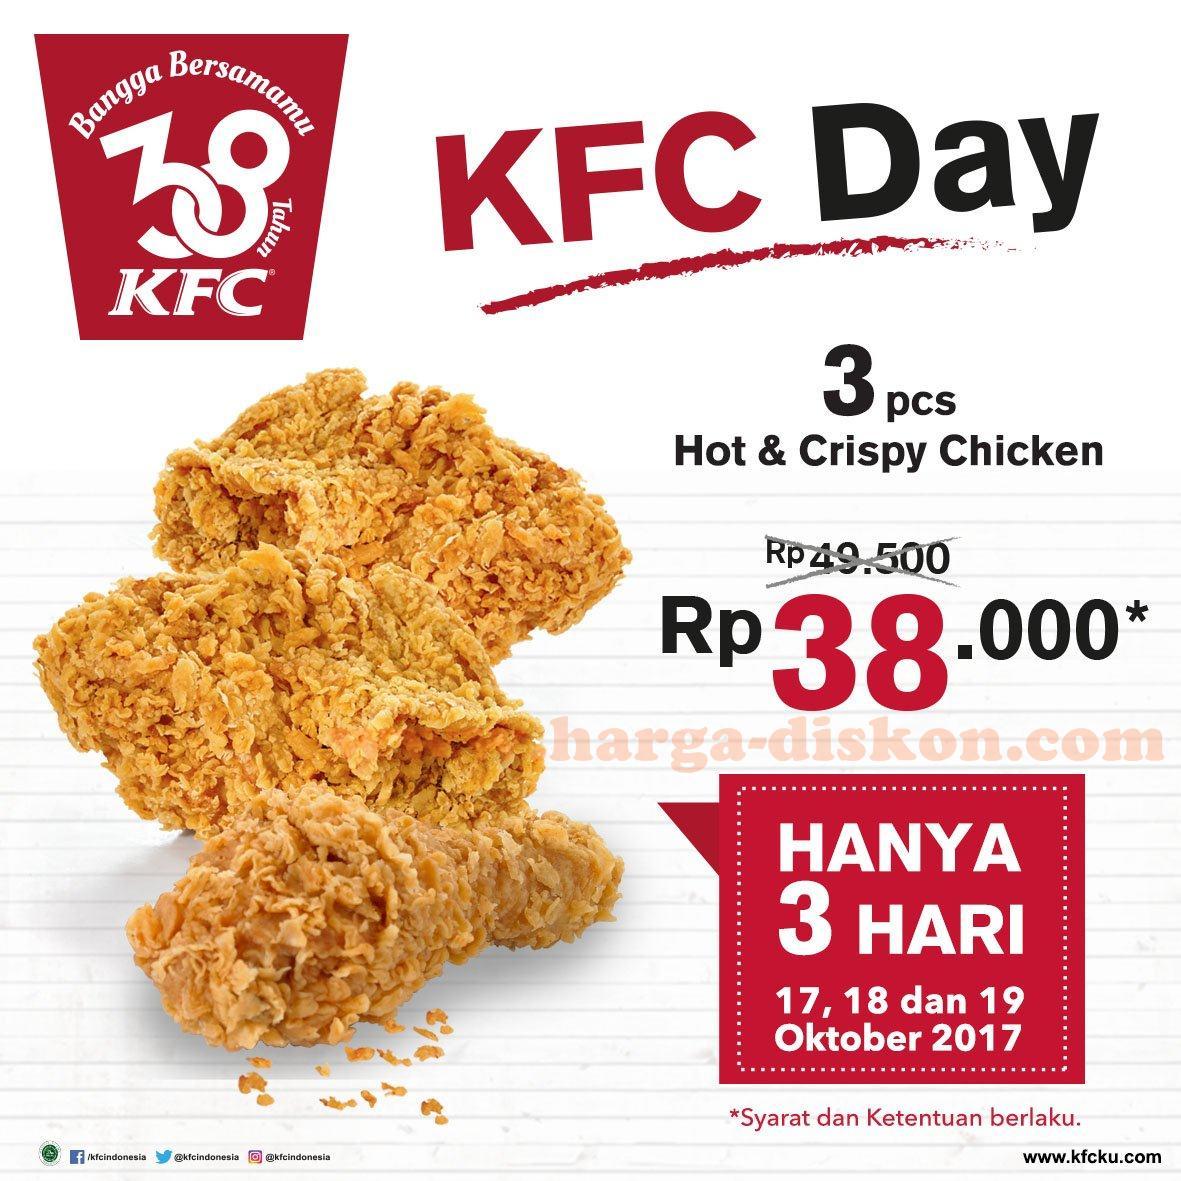 Promo Kfc Terbaru 3 Hot Crispy Chicken Rp38 000 Periode 17 19 Oktober 2017 Harga Diskon